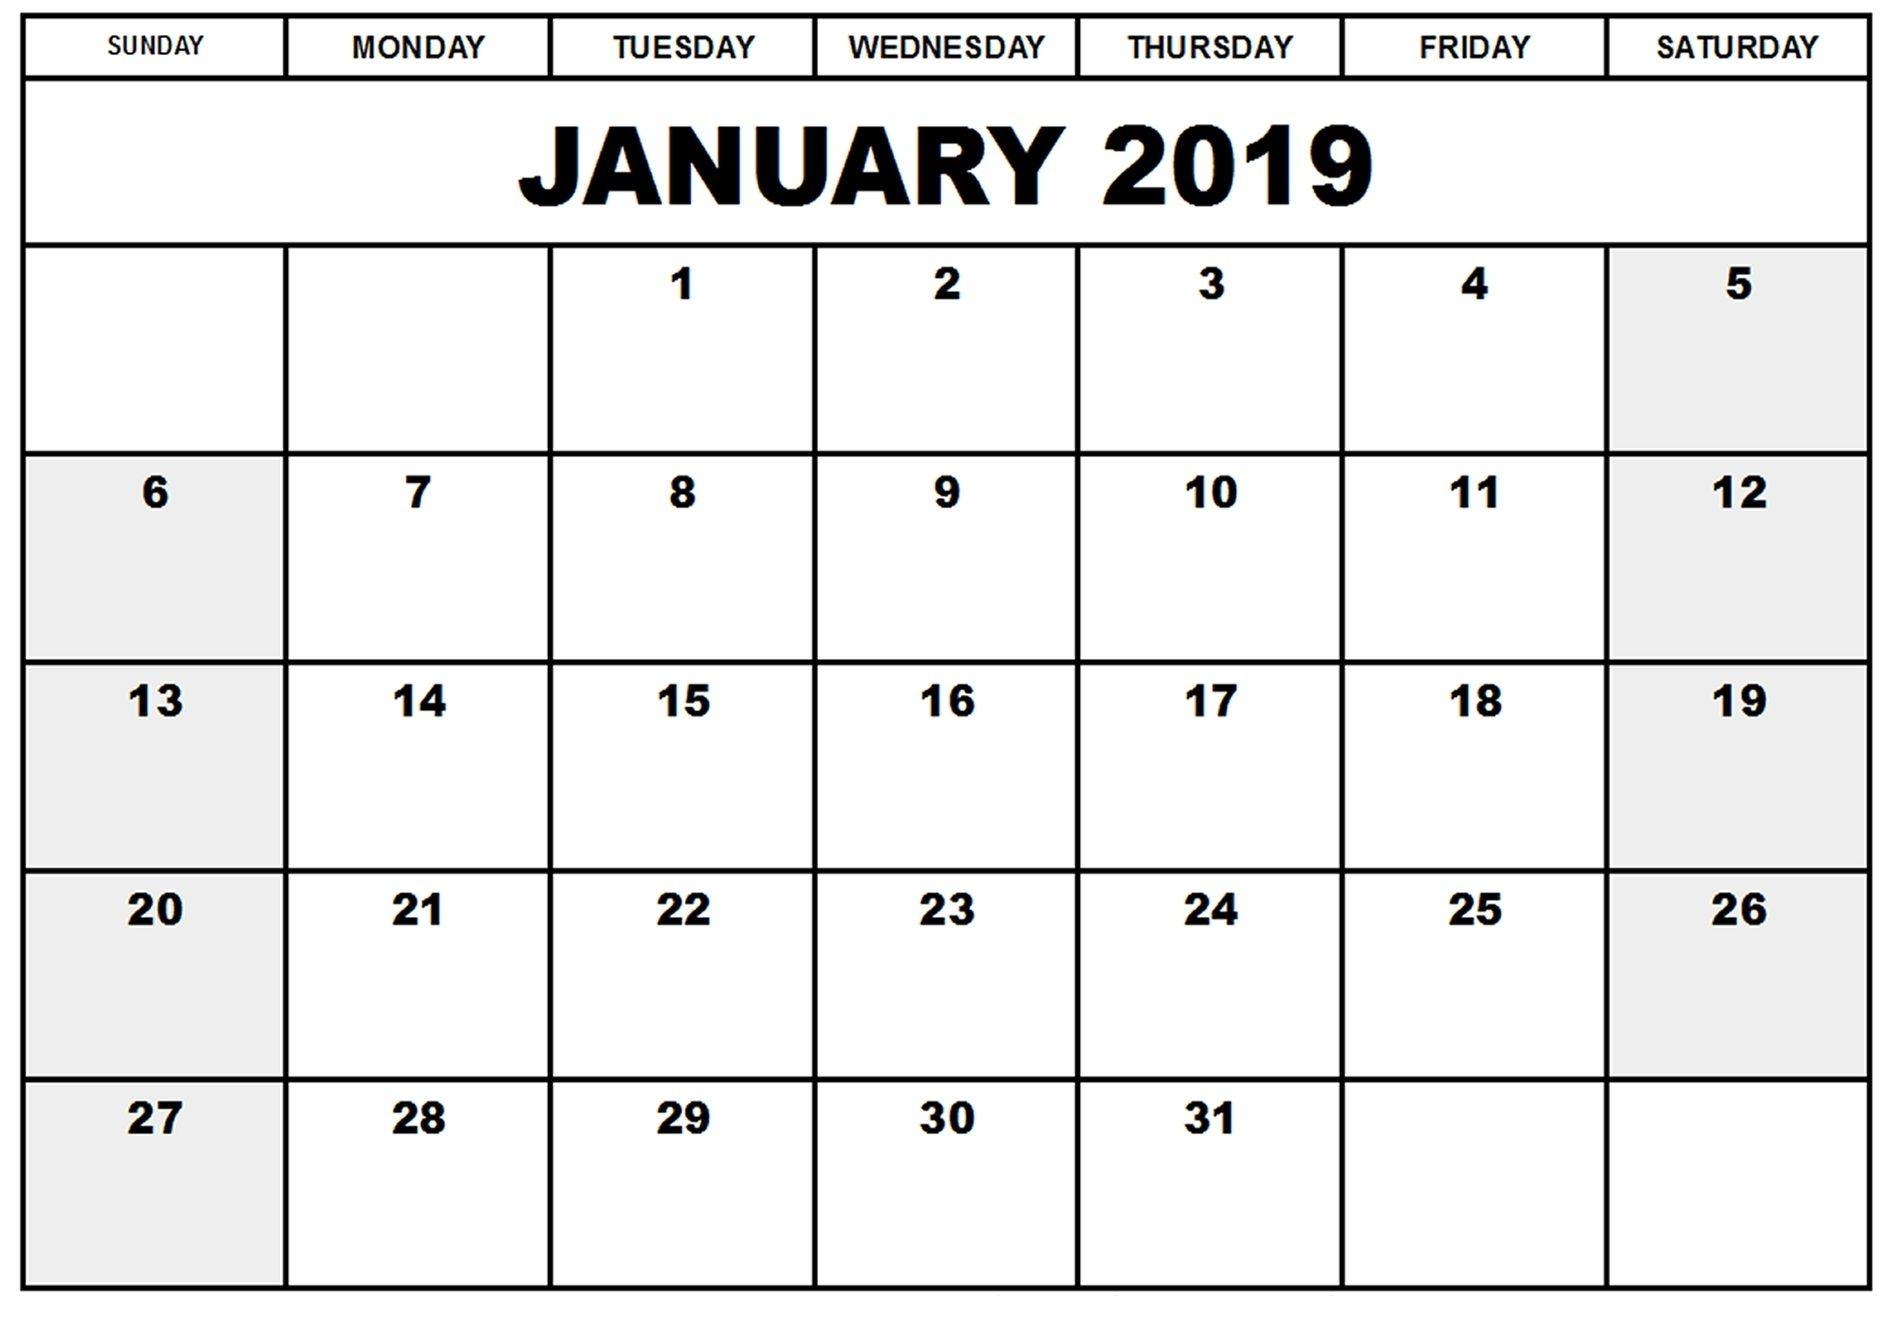 January Calendar 2019 Malayalam - Free Printable Calendar